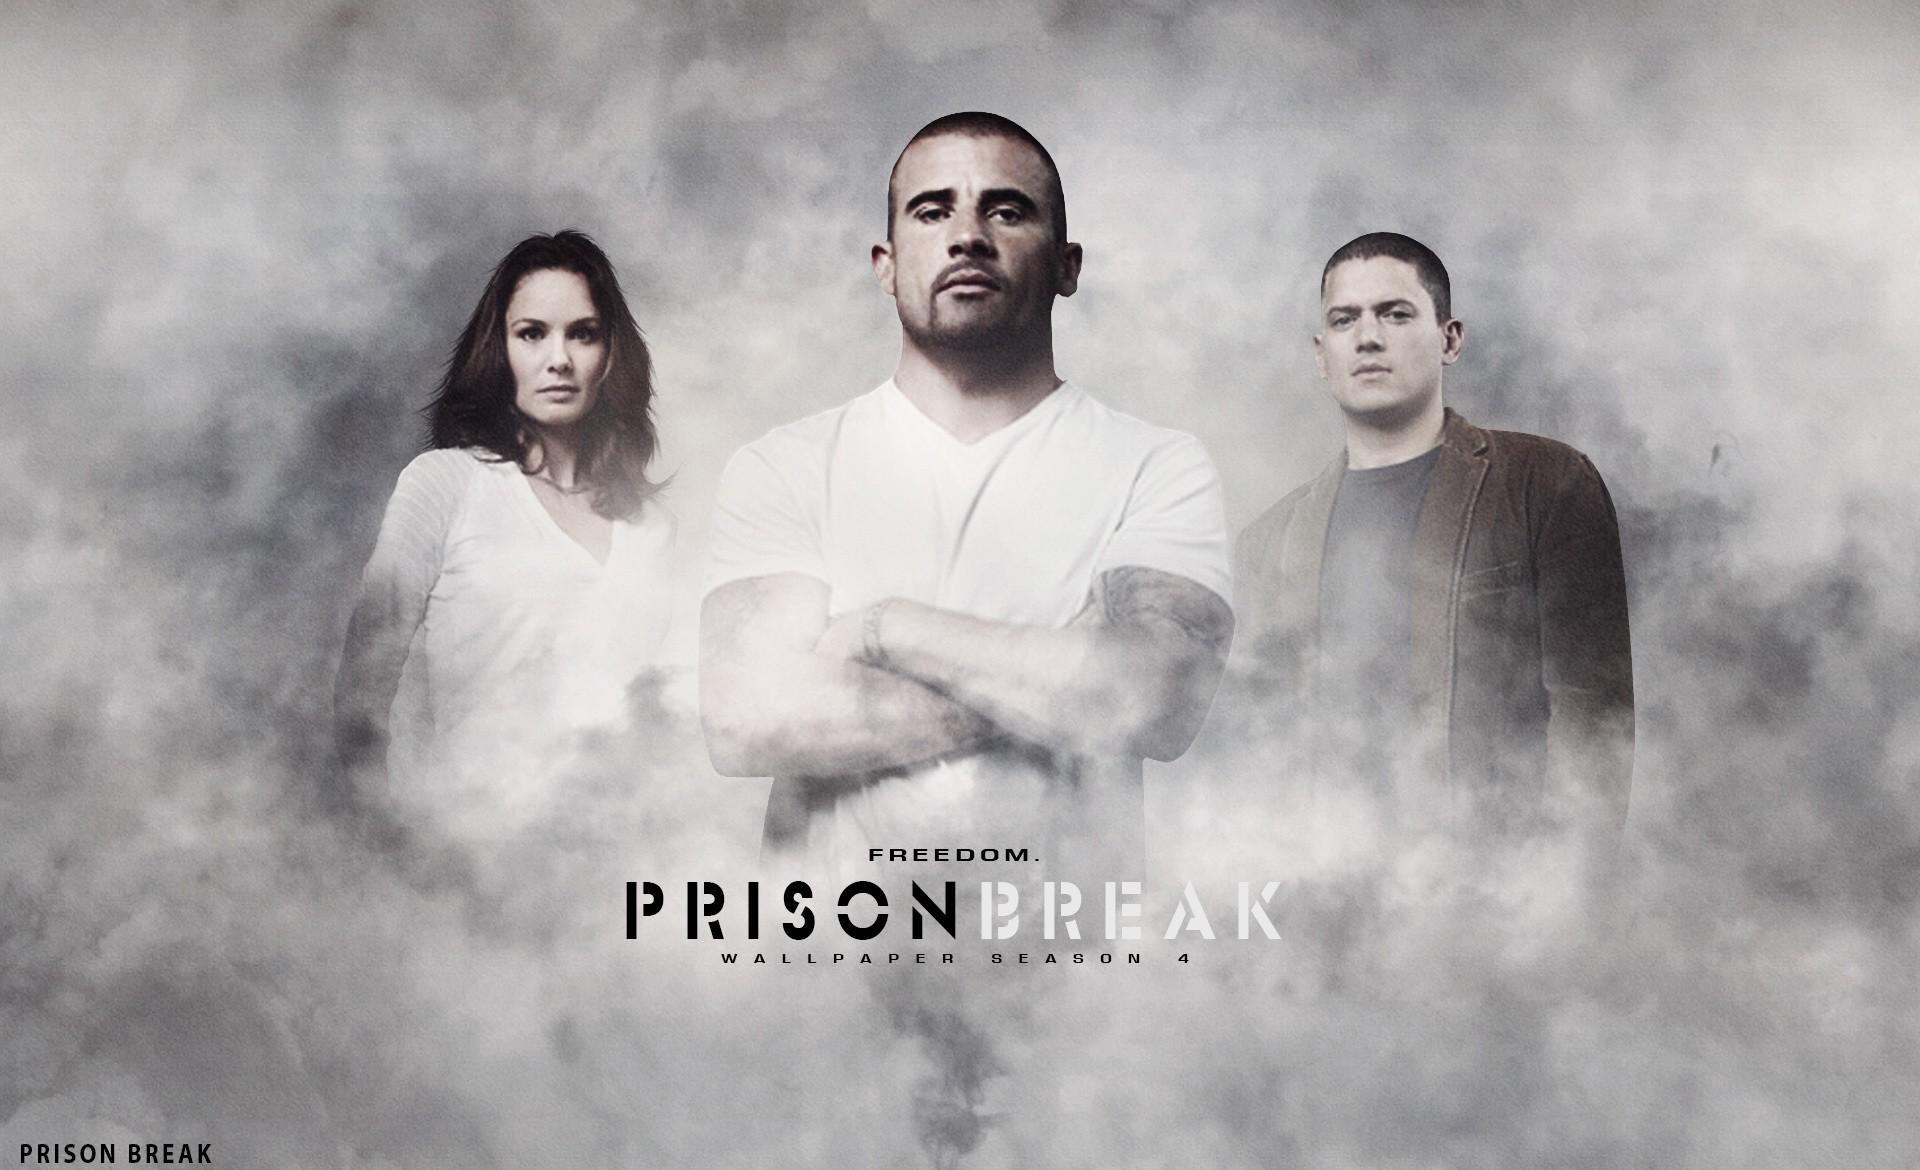 prison break season 4 wallpaper  56  images